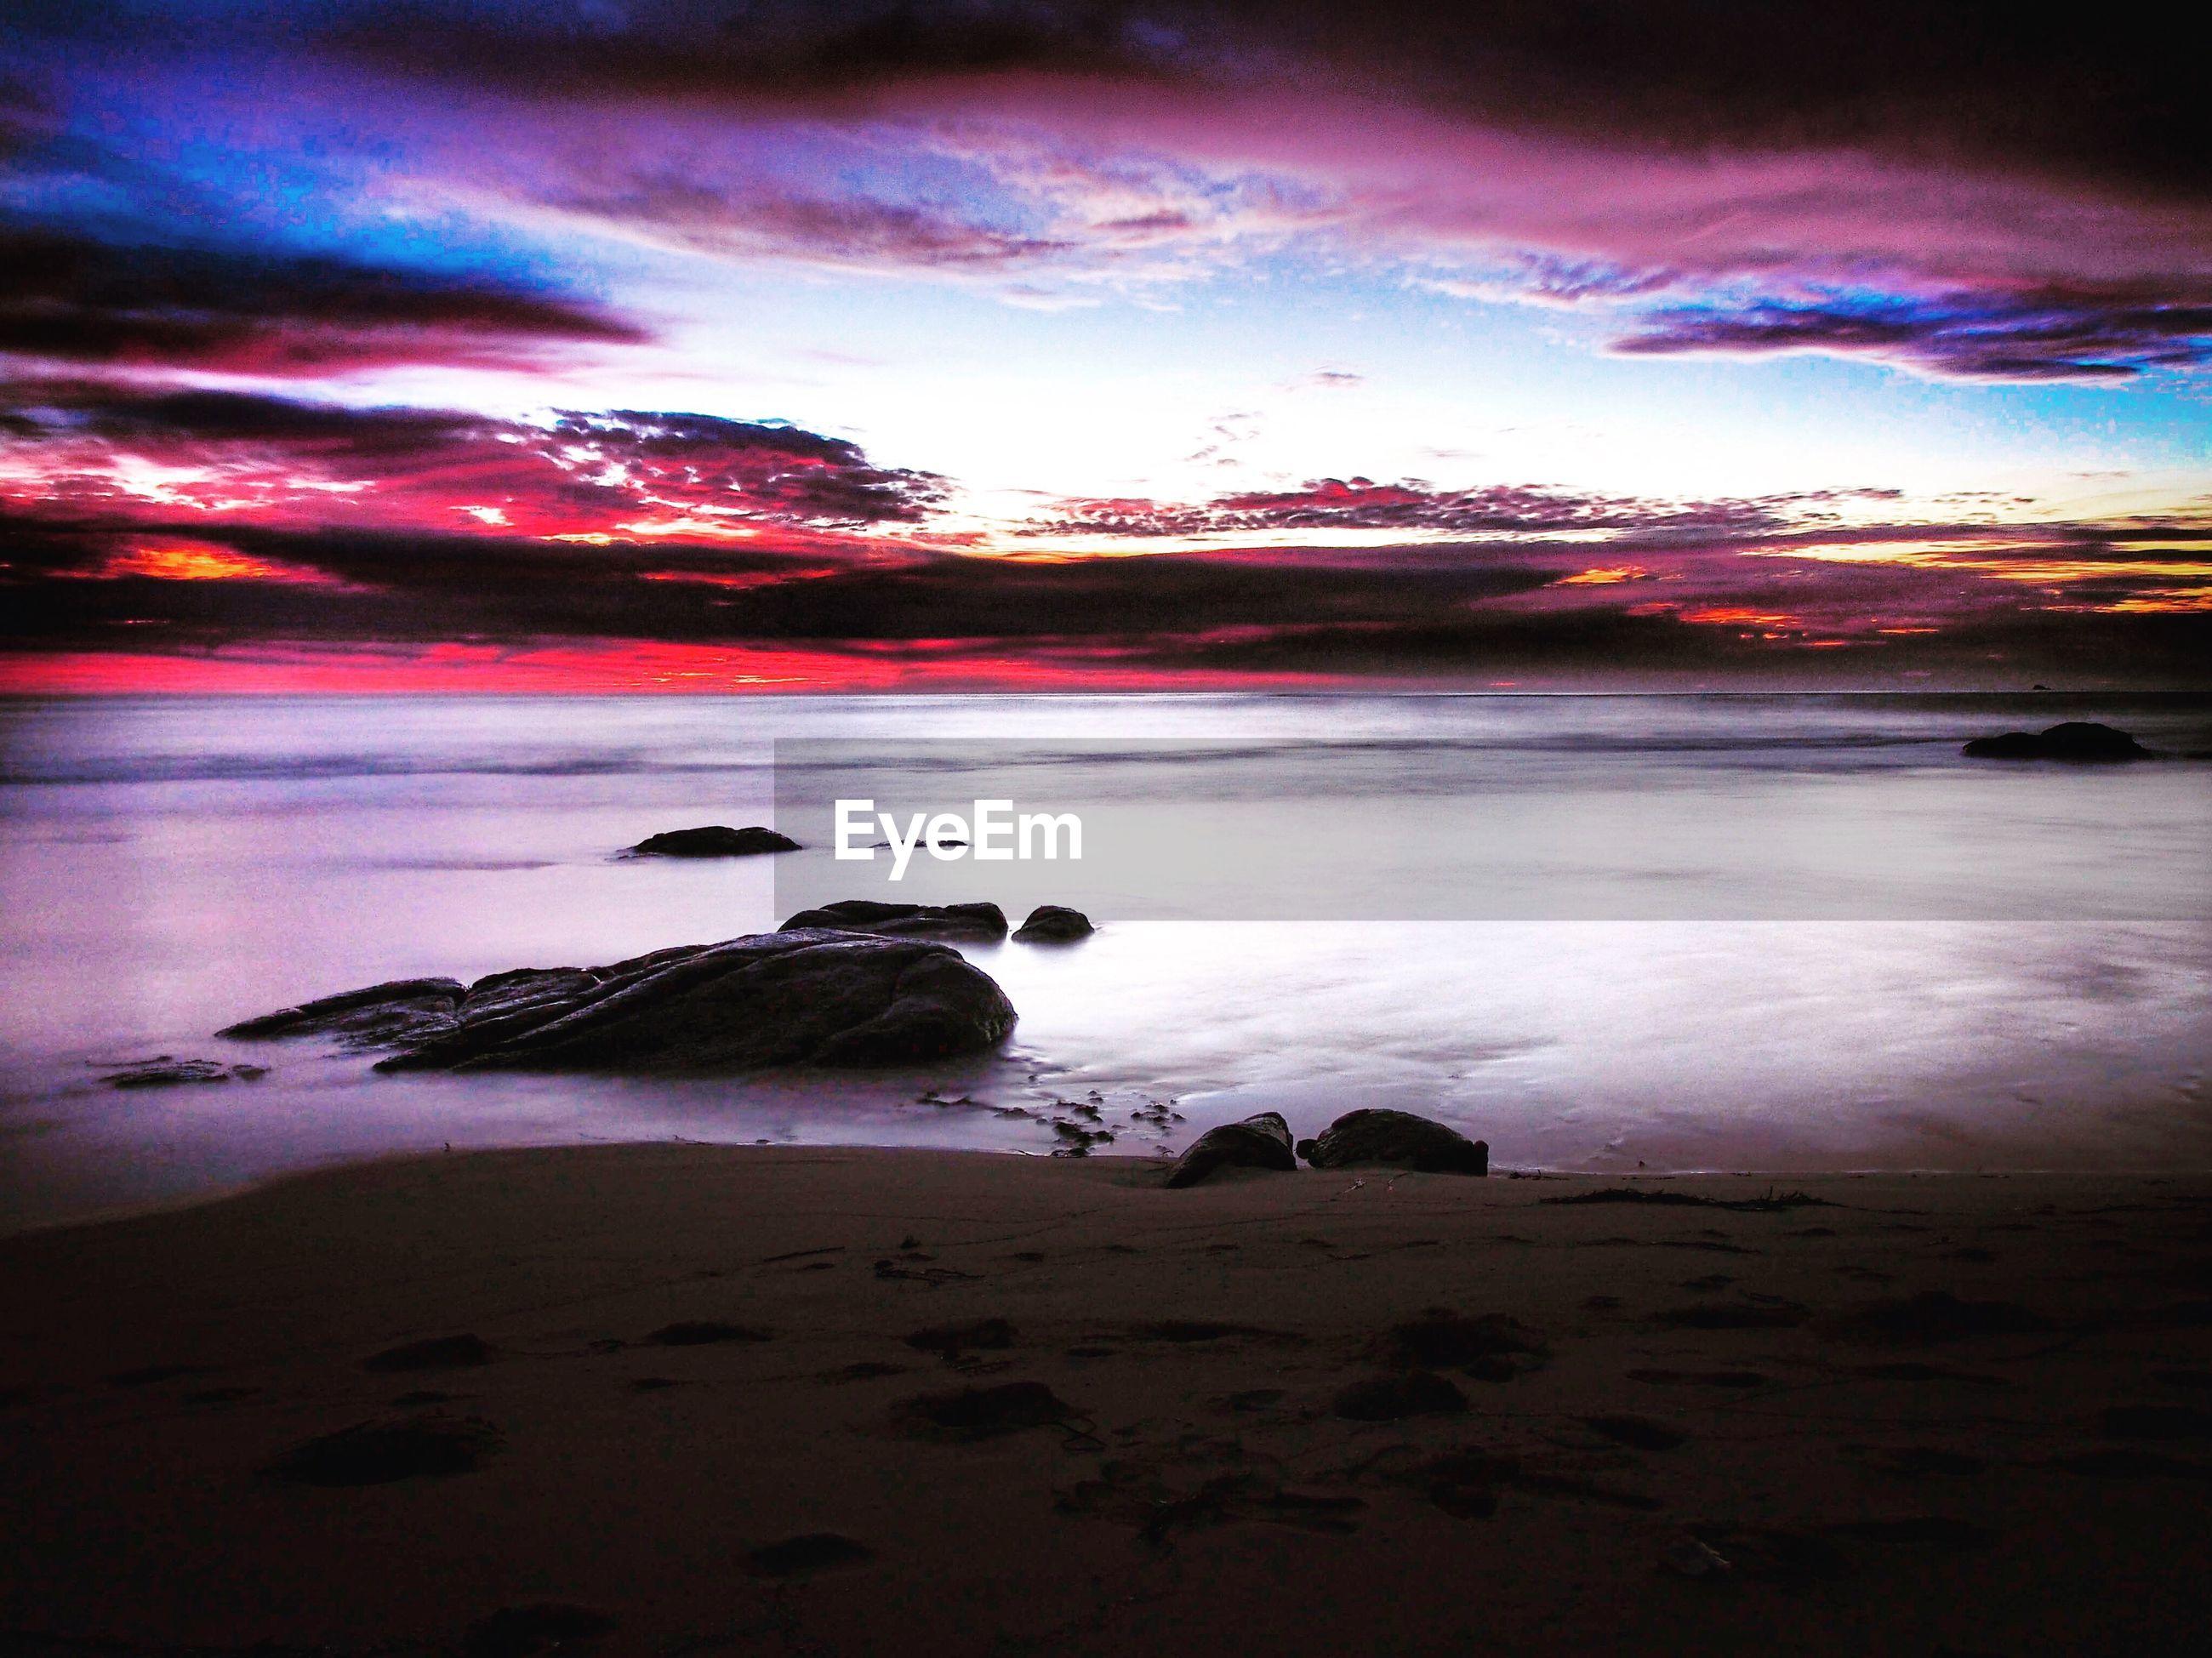 water, sky, beach, sunset, sea, scenics, tranquil scene, shore, cloud - sky, beauty in nature, tranquility, nature, dusk, cloudy, idyllic, rock - object, coastline, sand, cloud, dramatic sky